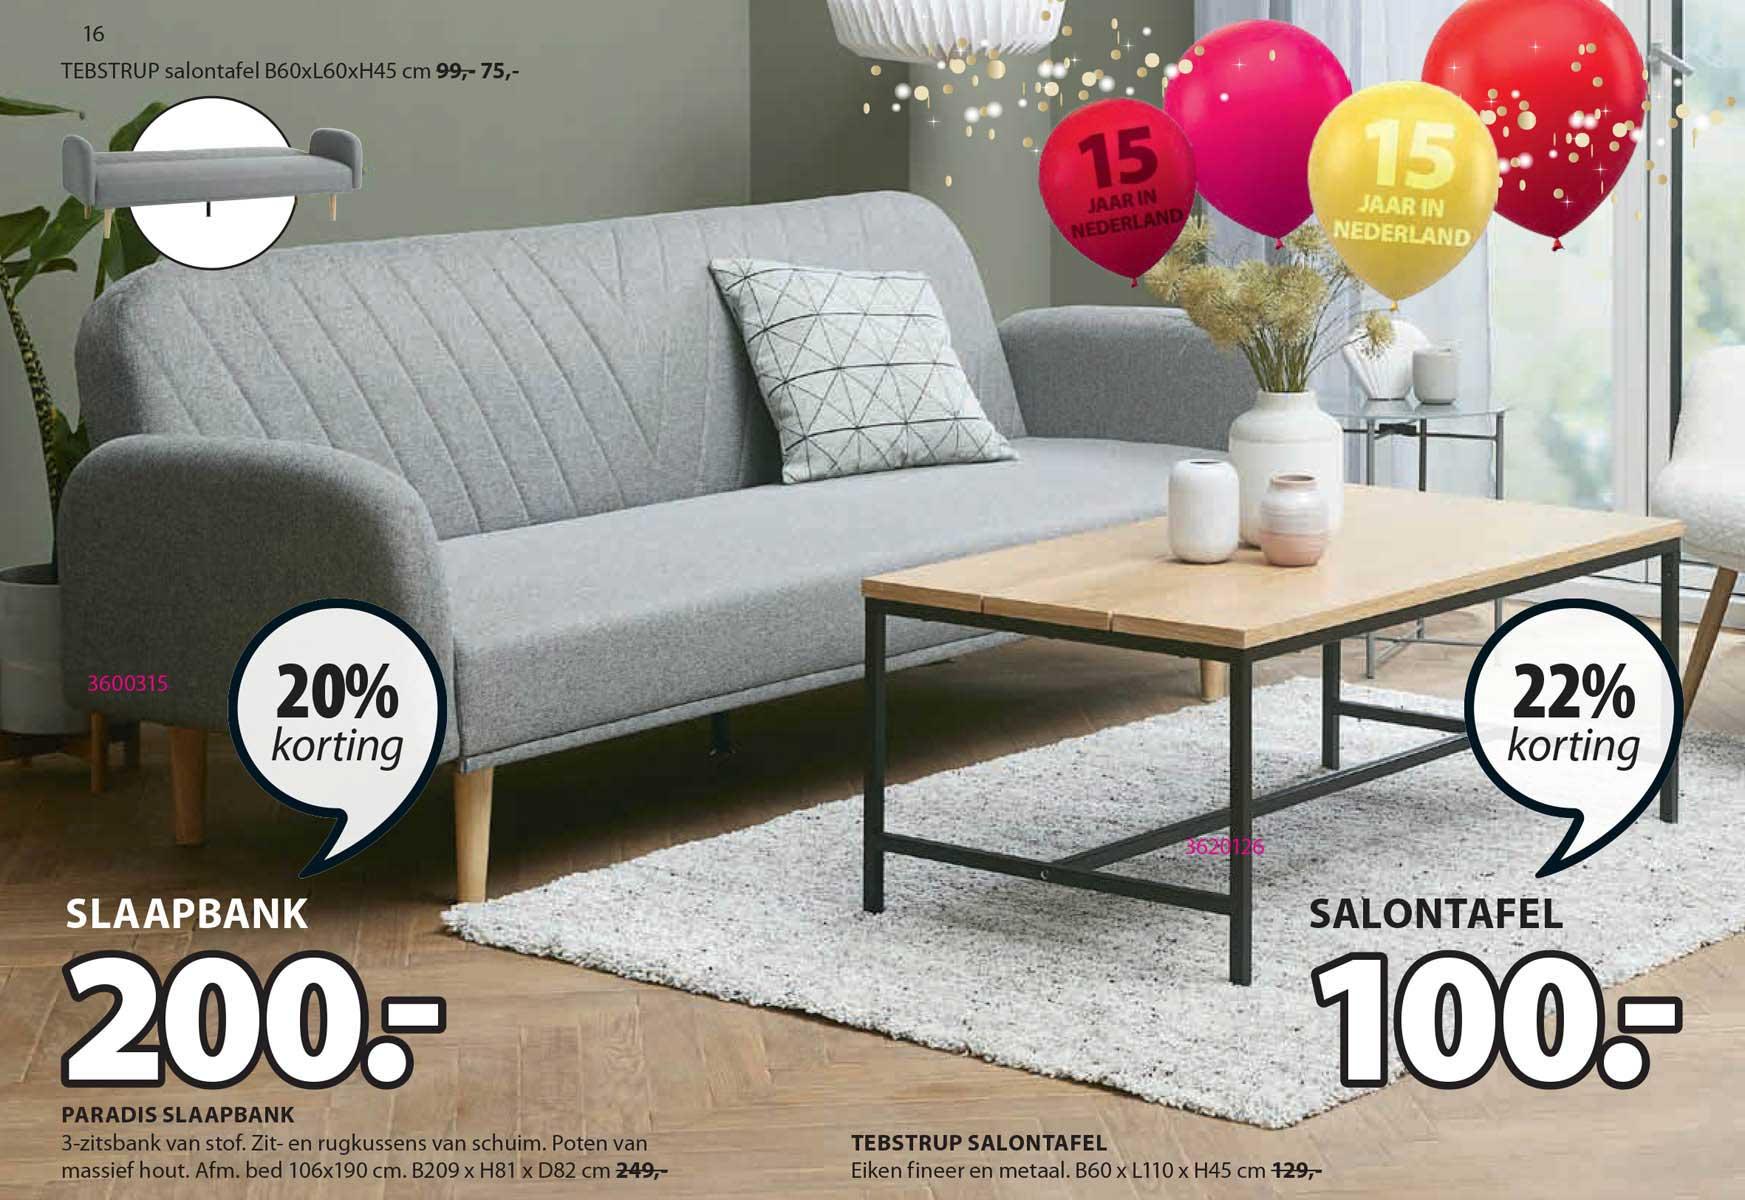 Jysk Paradis Slaapbank Of Tebstrup Salontafel 20% - 22% Korting